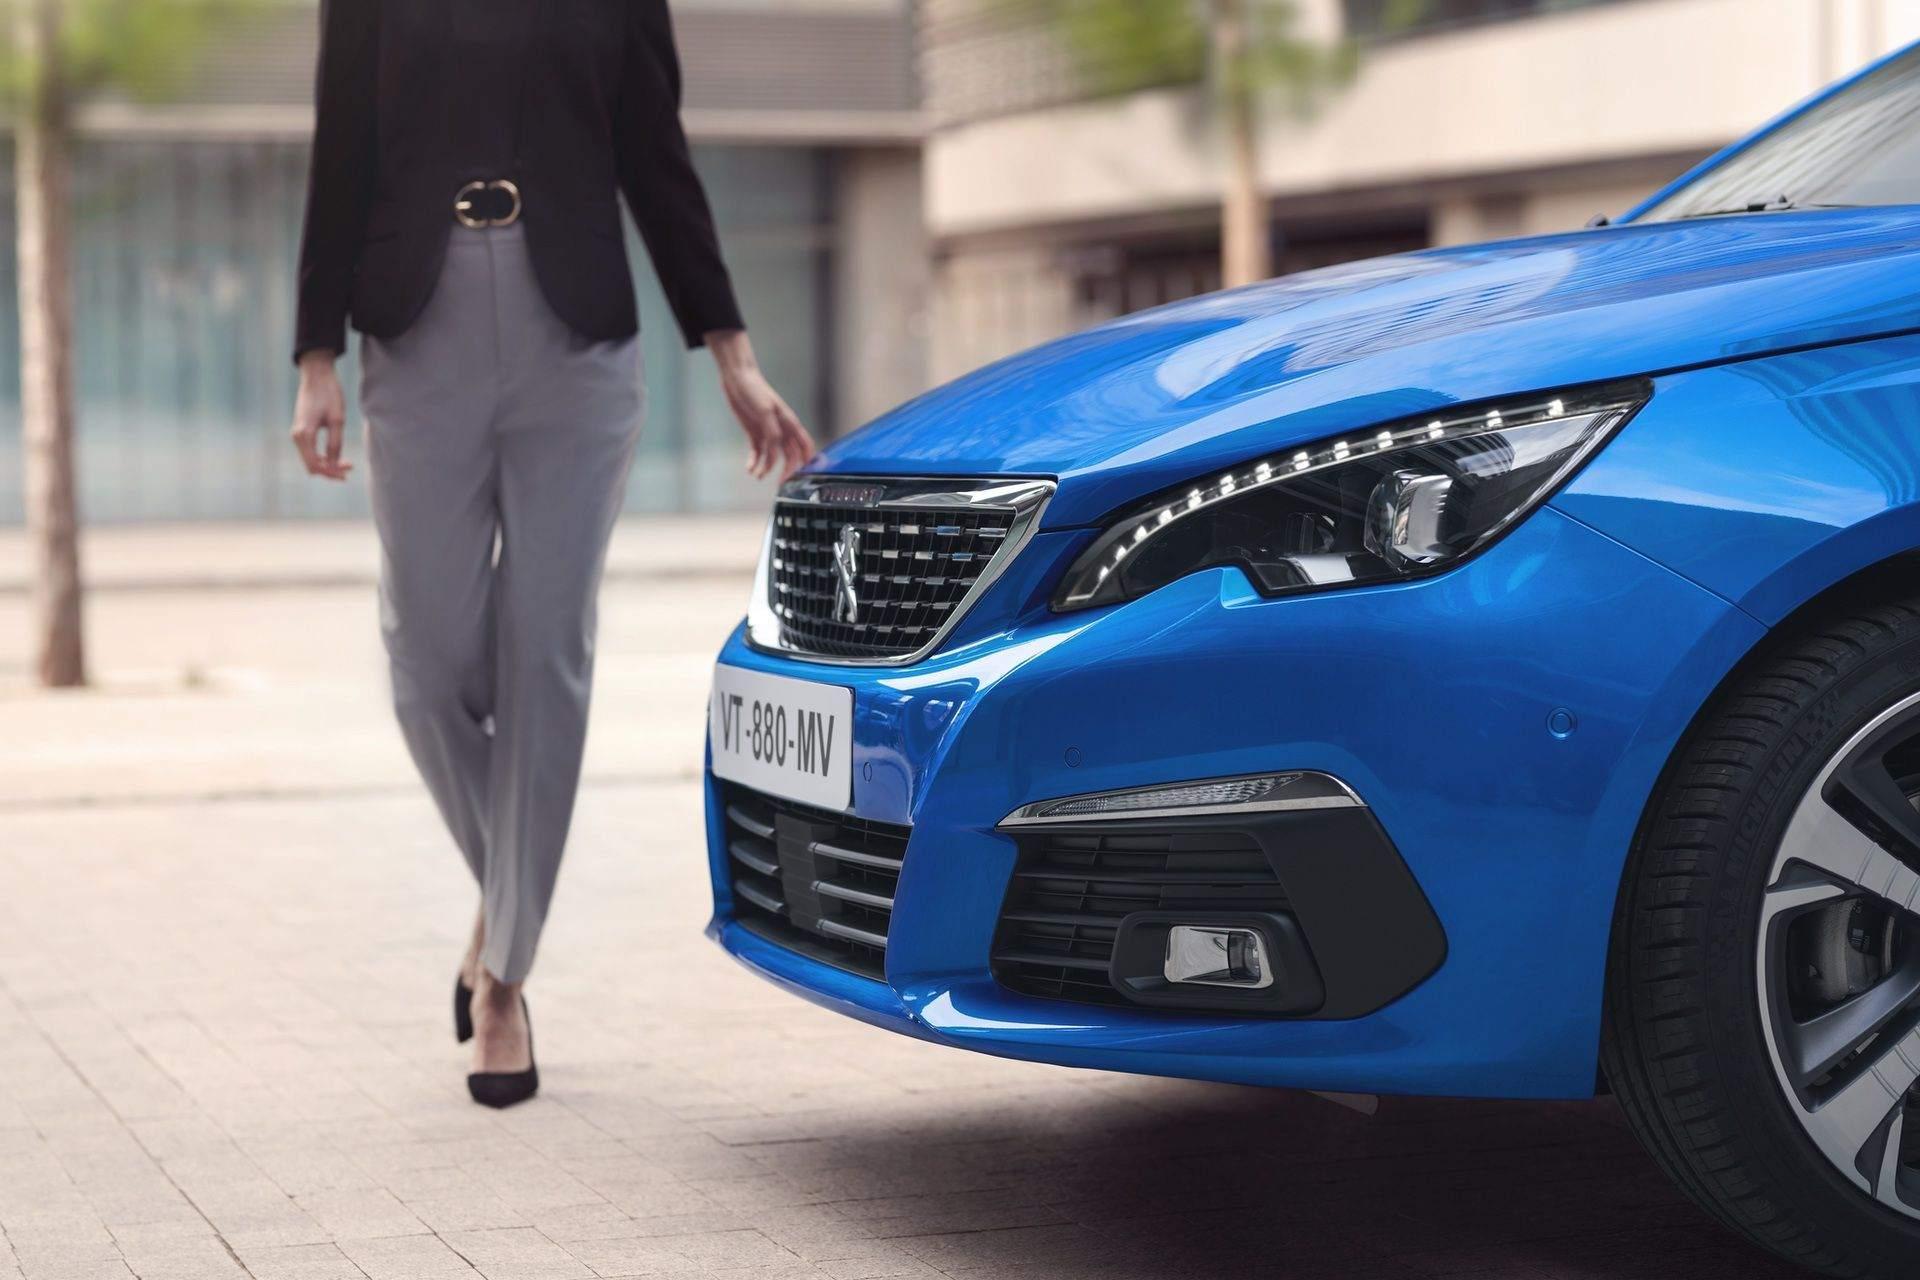 2020_Peugeot_308_facelift_0011